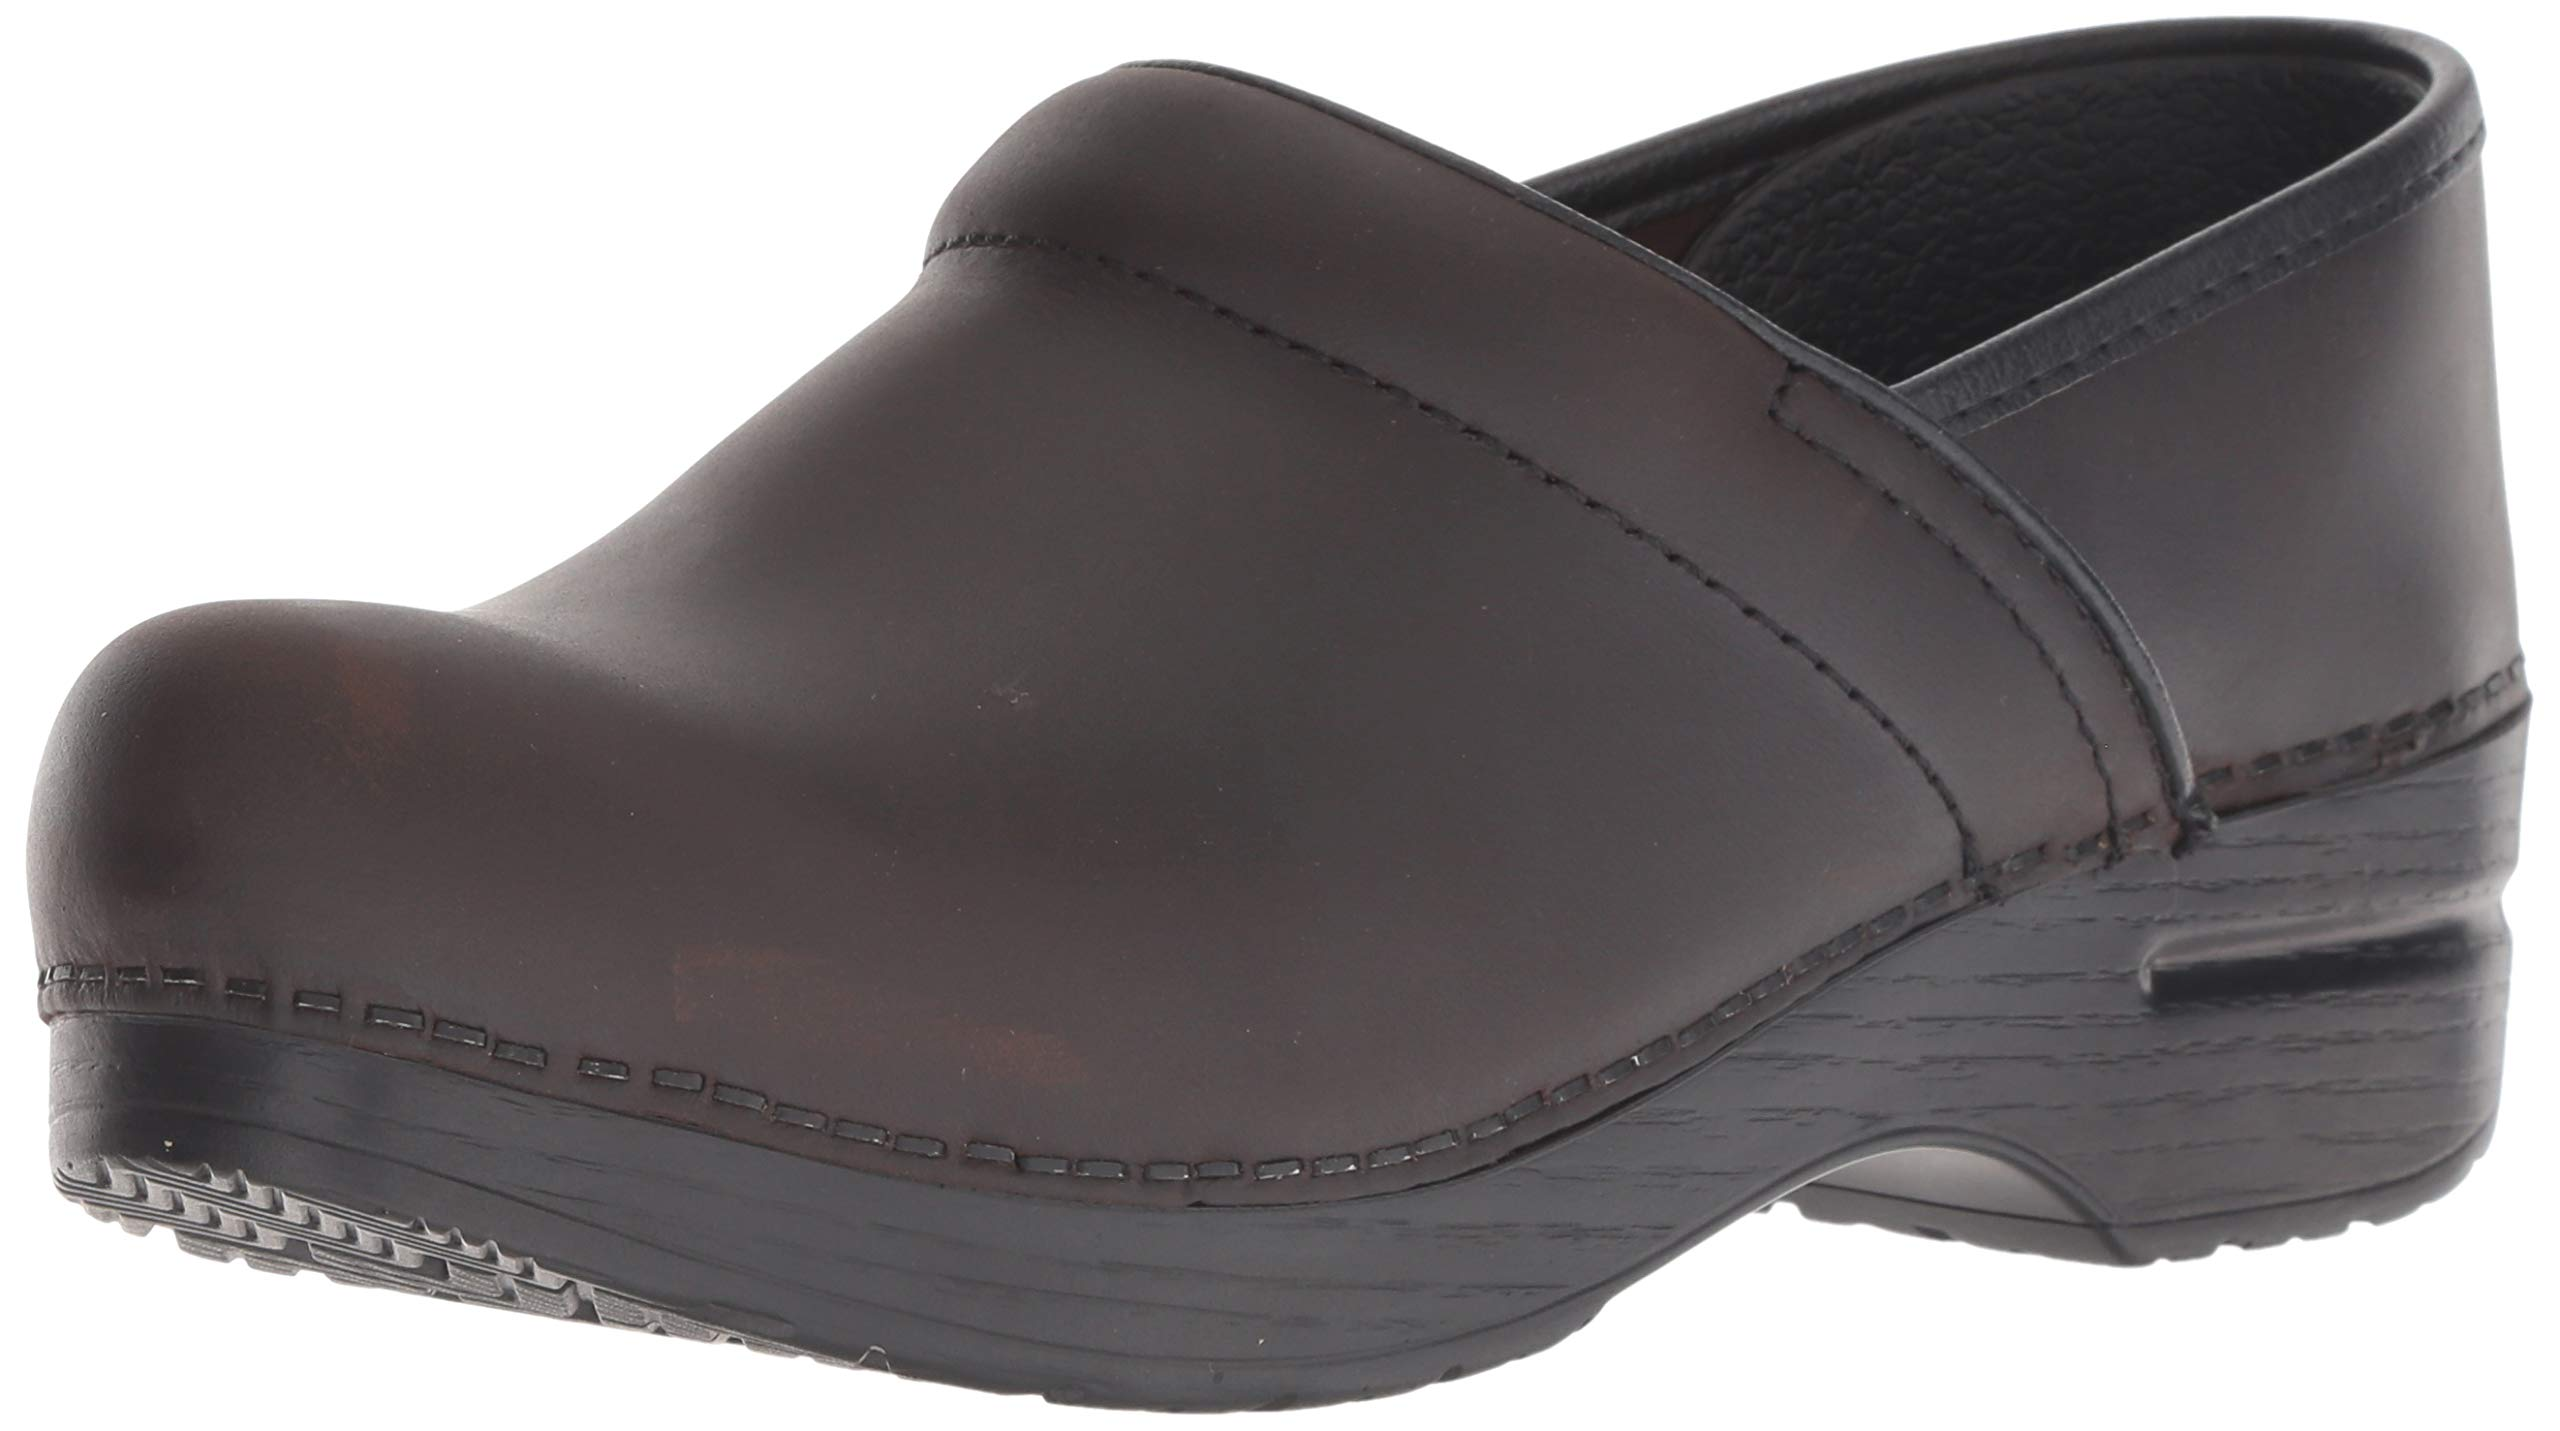 Dansko Women's Professional Mule,Antique Brown - Black Oiled Leather,37 EU/6.5-7 M US